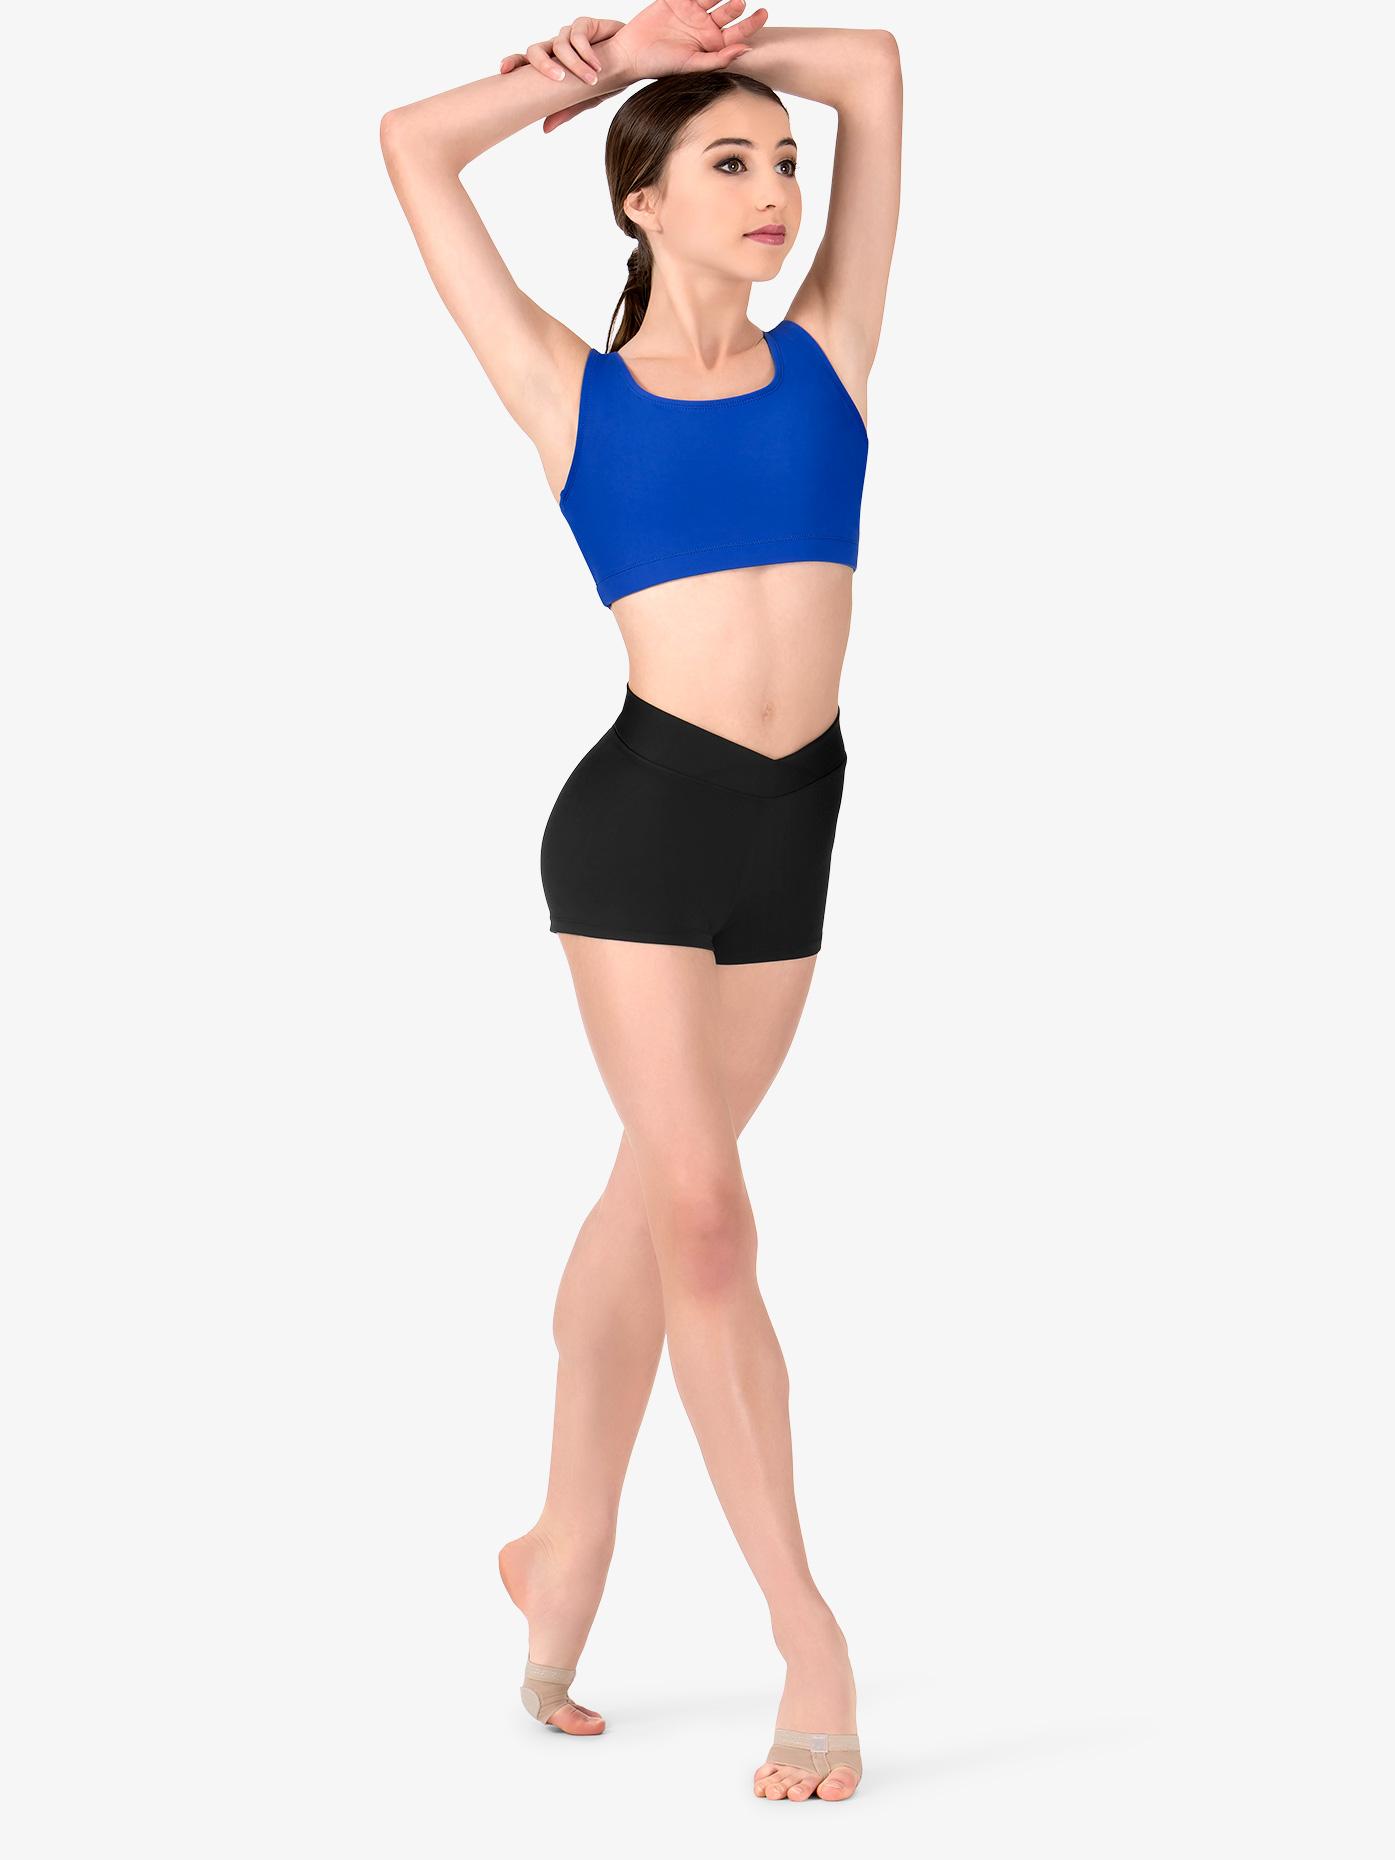 78c4ecbbb3e2c Womens Team Basic Compression V-Front Dance Shorts - Style No BT5204. Loading  zoom